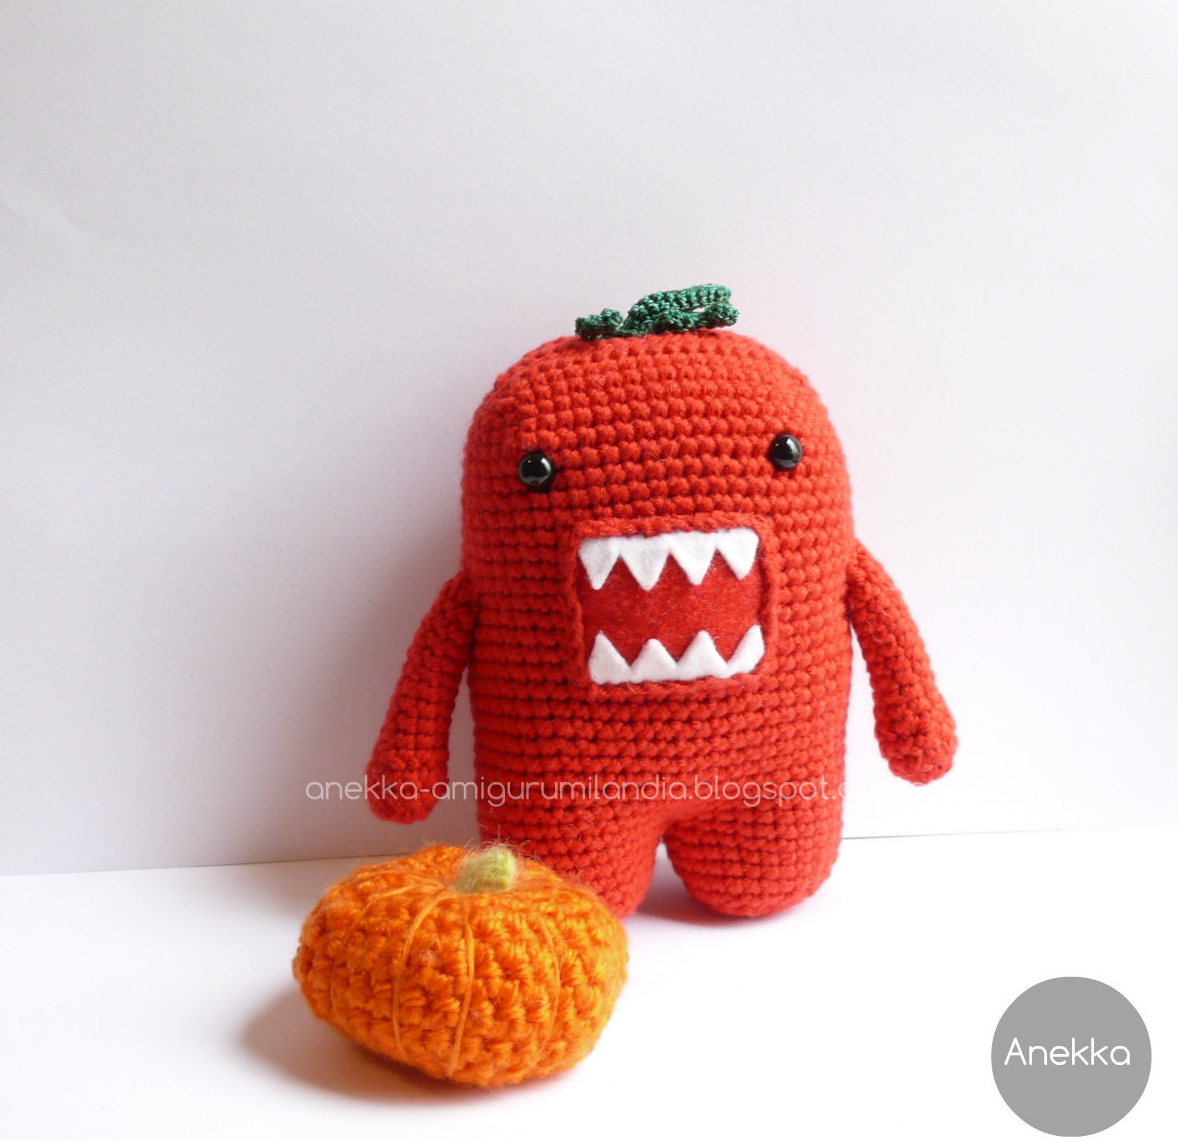 domokun tomato anekka handmade